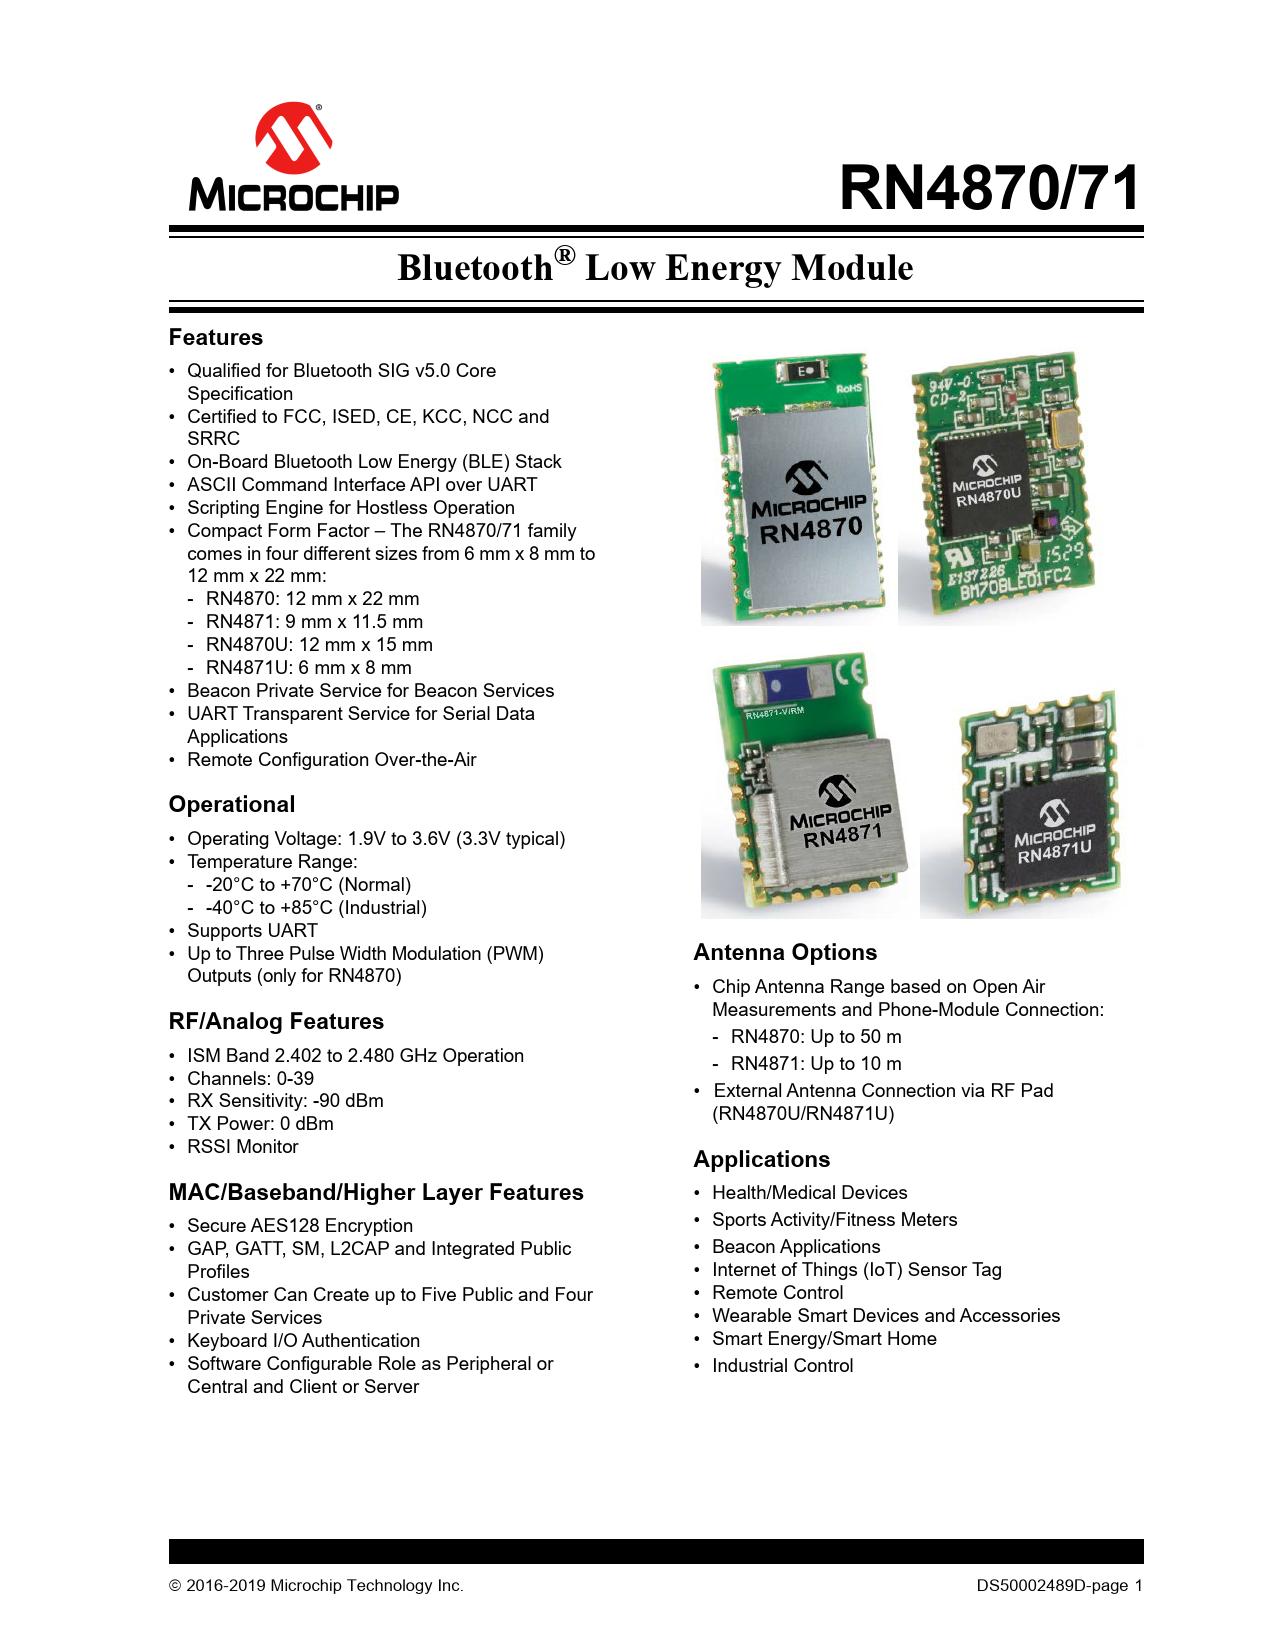 Datasheet RN4870, RN4871 Microchip